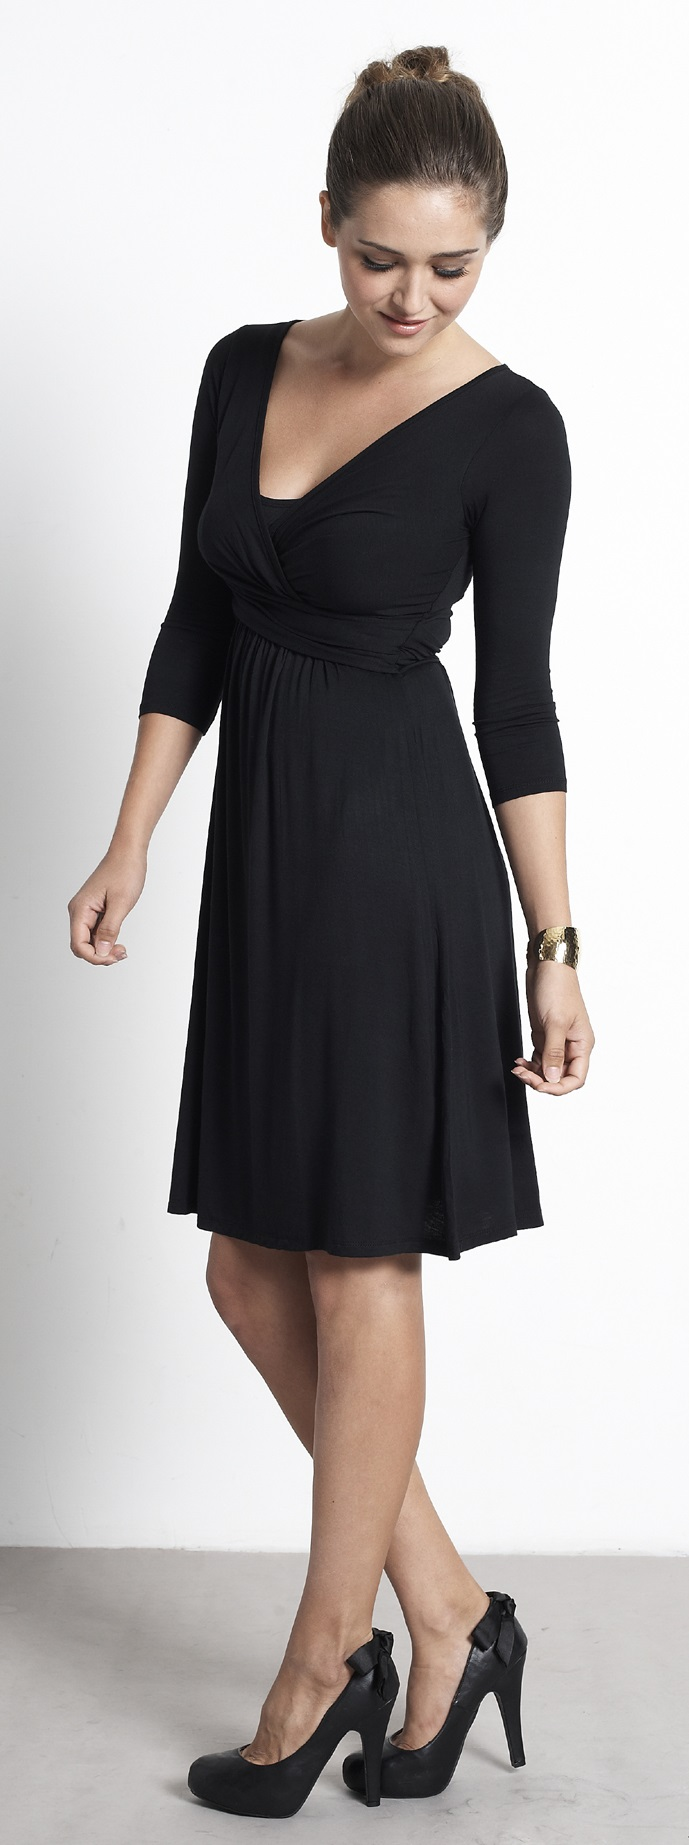 mothers-en-vouge-wrap-nursing-dress-black-4.jpg